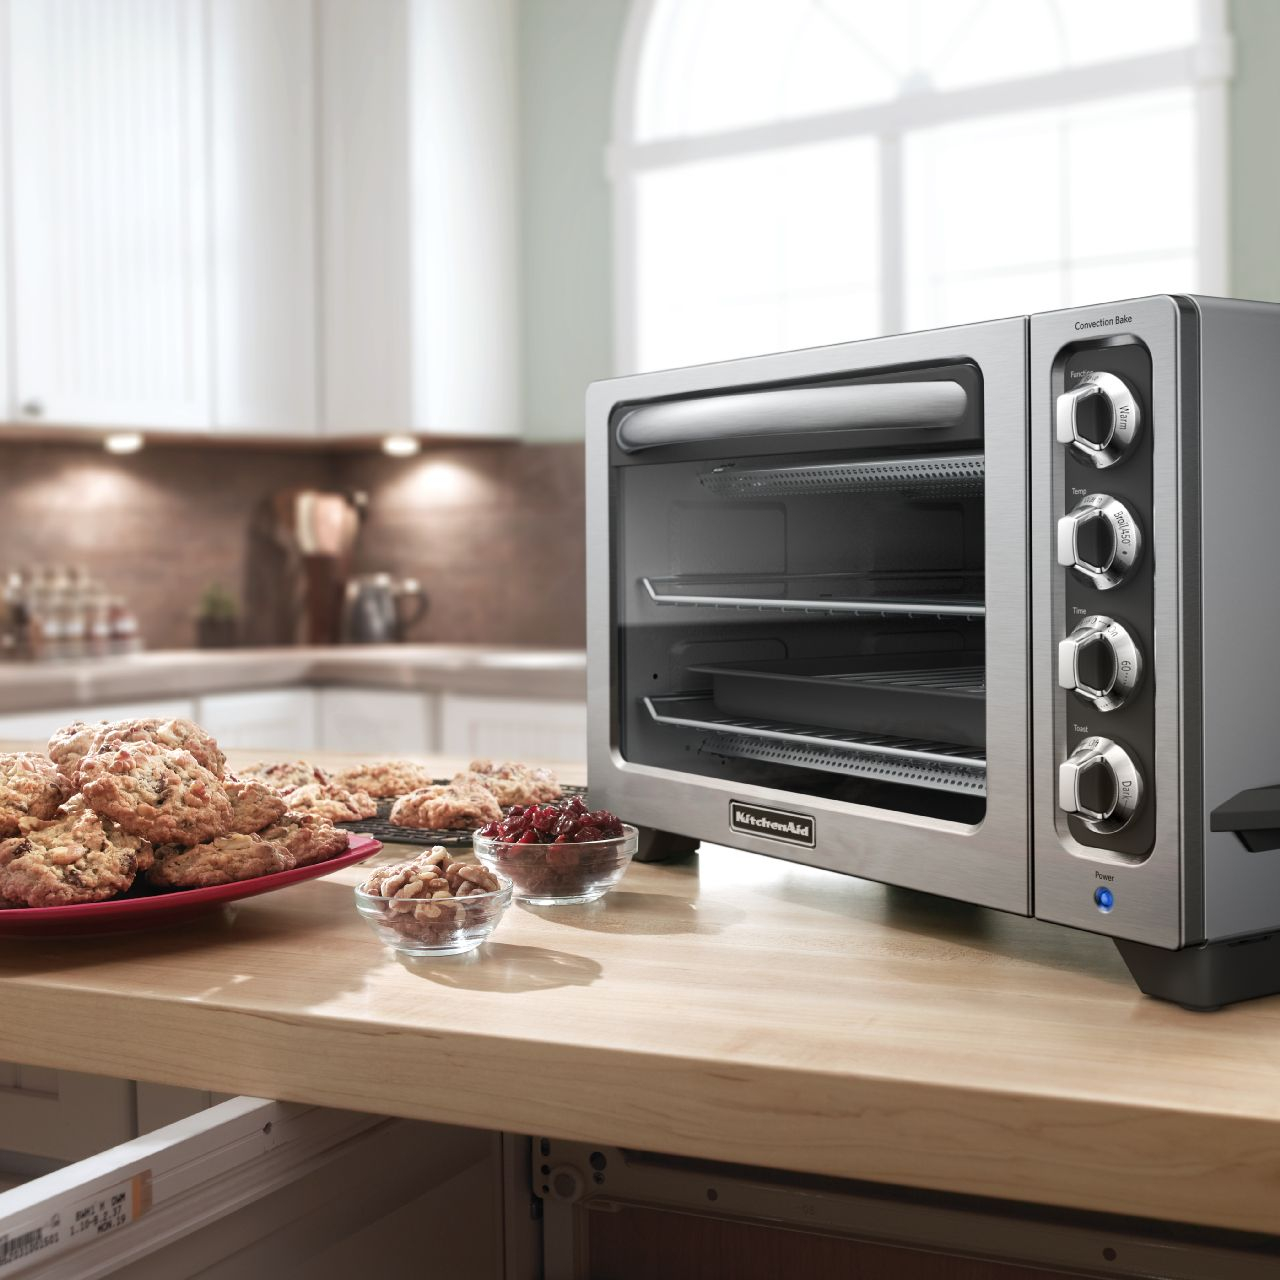 KitchenAid Contour Silver Convection Countertop Oven with Black Handle